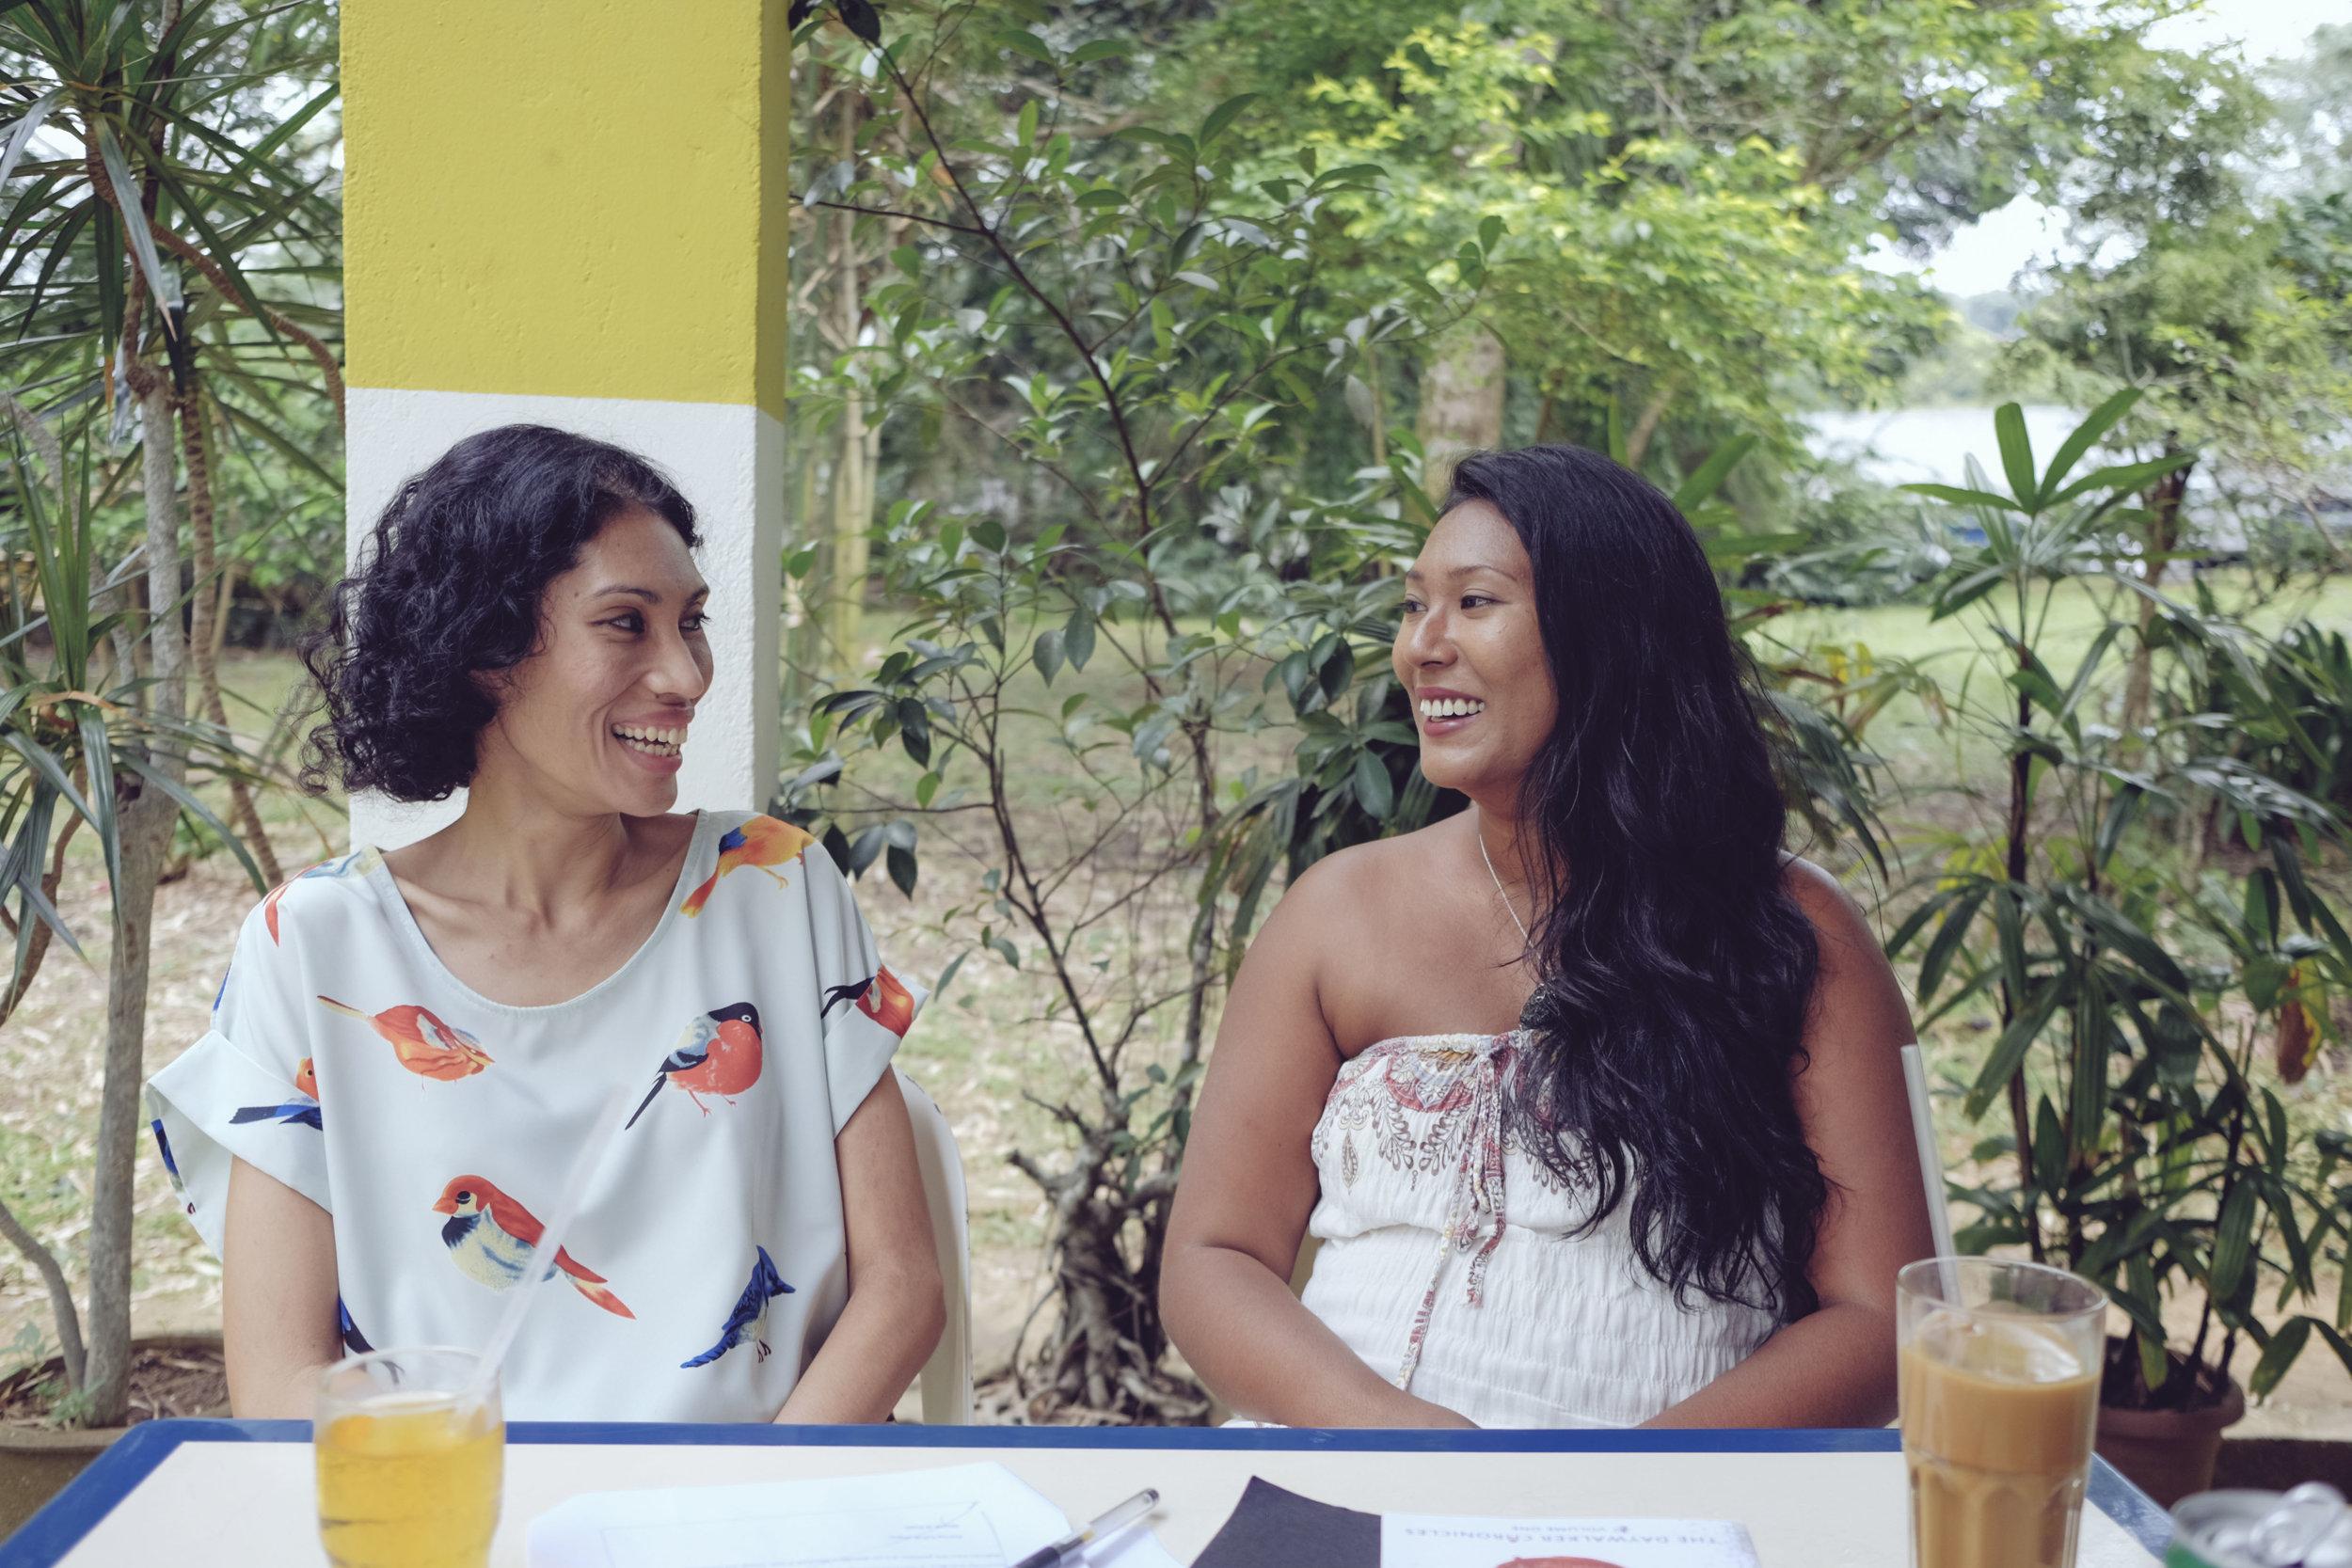 Melissa De Silva (L) and Samantha De Silva (R) enjoying a chat at Colbar in Portsdown Road